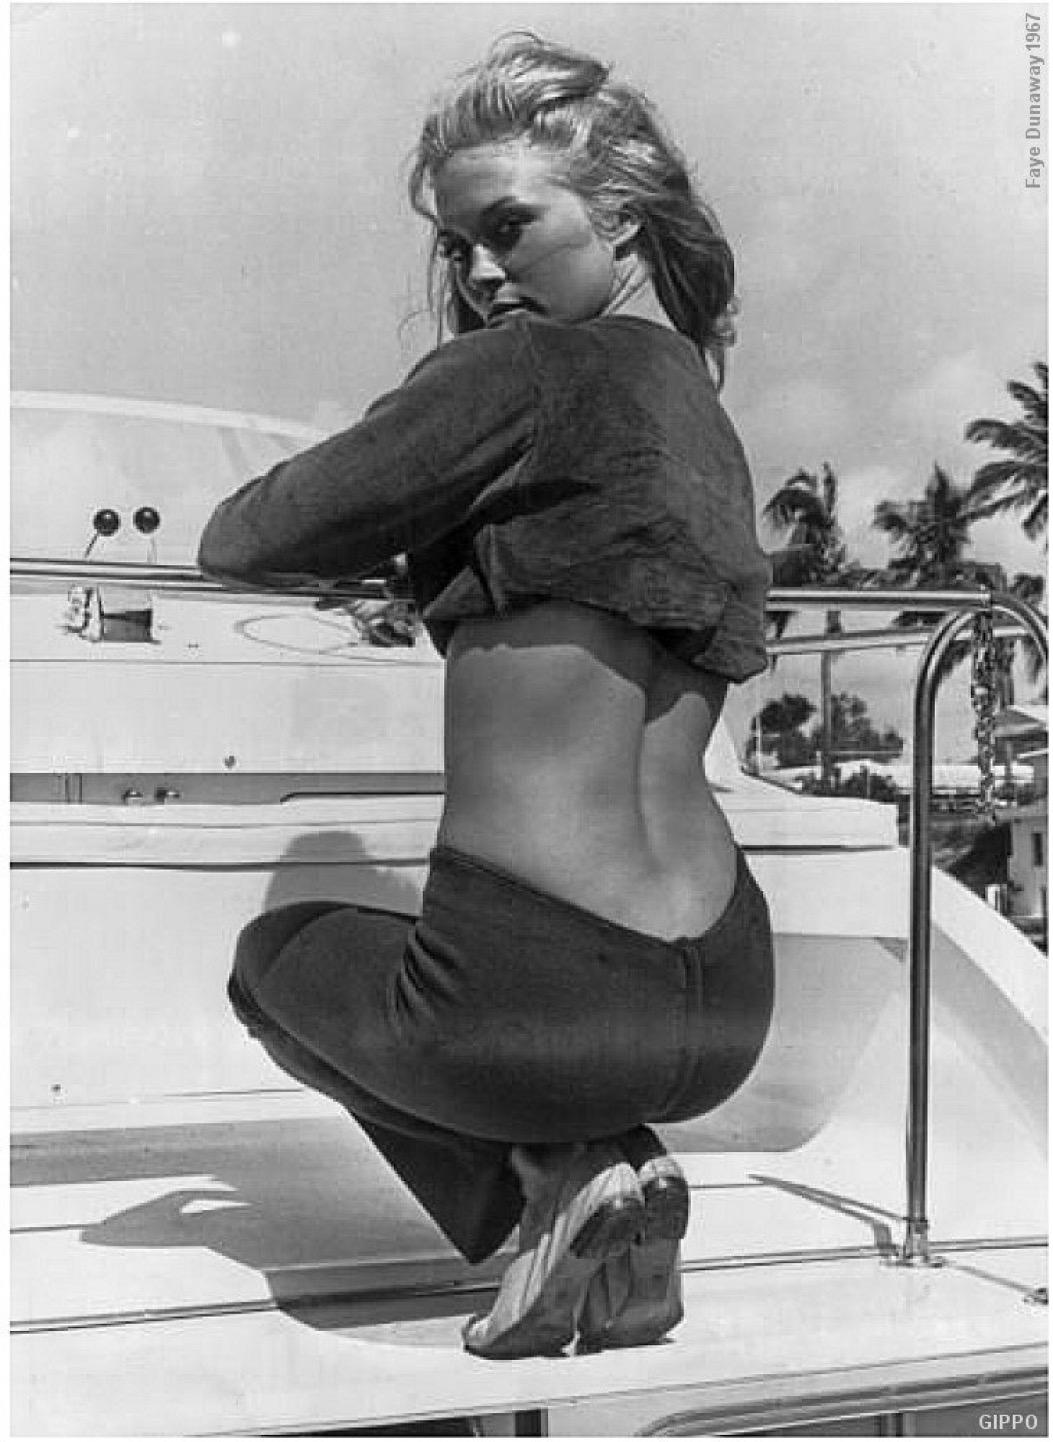 Happy birthday Faye Dunaway(born 14.1.1941)